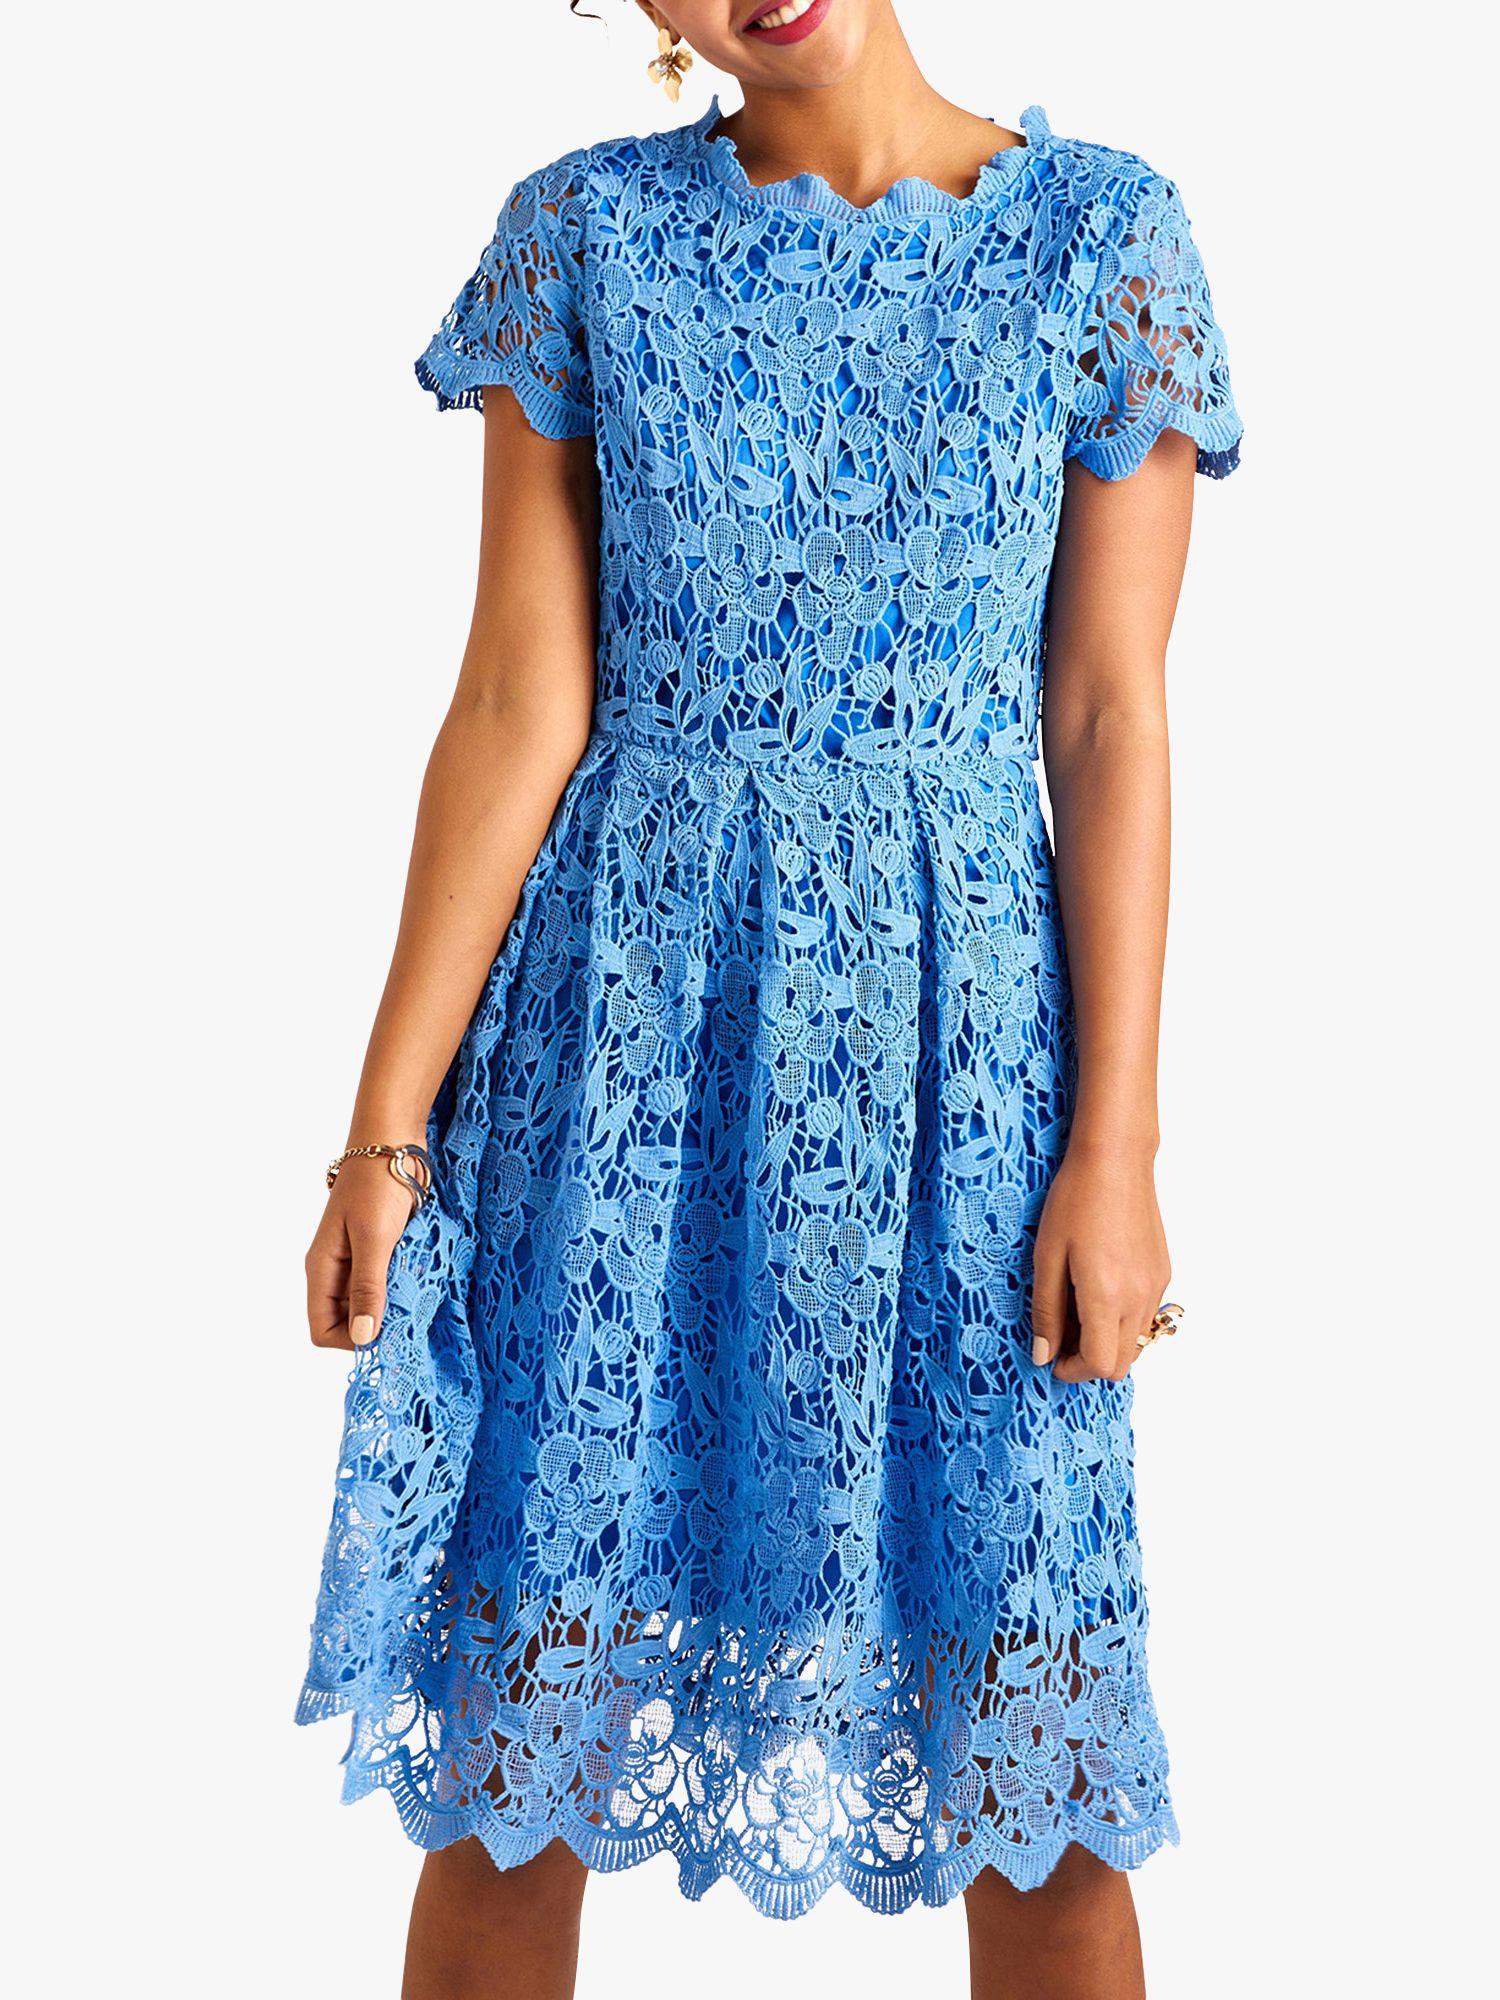 Yumi Yumi Floral Lace Dress, Blue/Multi